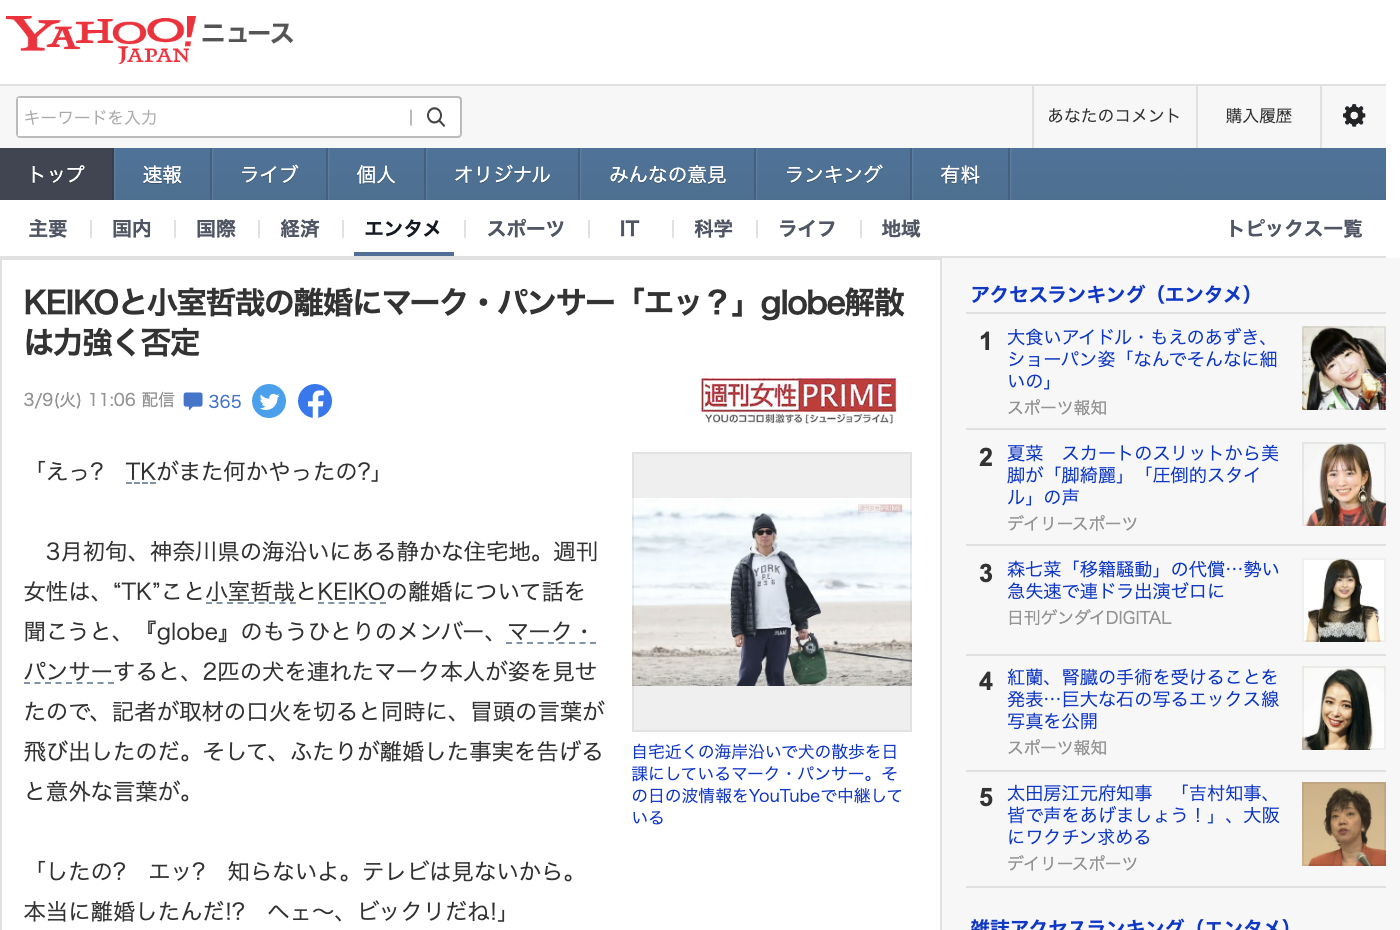 KEIKOと小室哲哉の離婚にマーク・パンサー「エッ?」globe解散は力強く否定